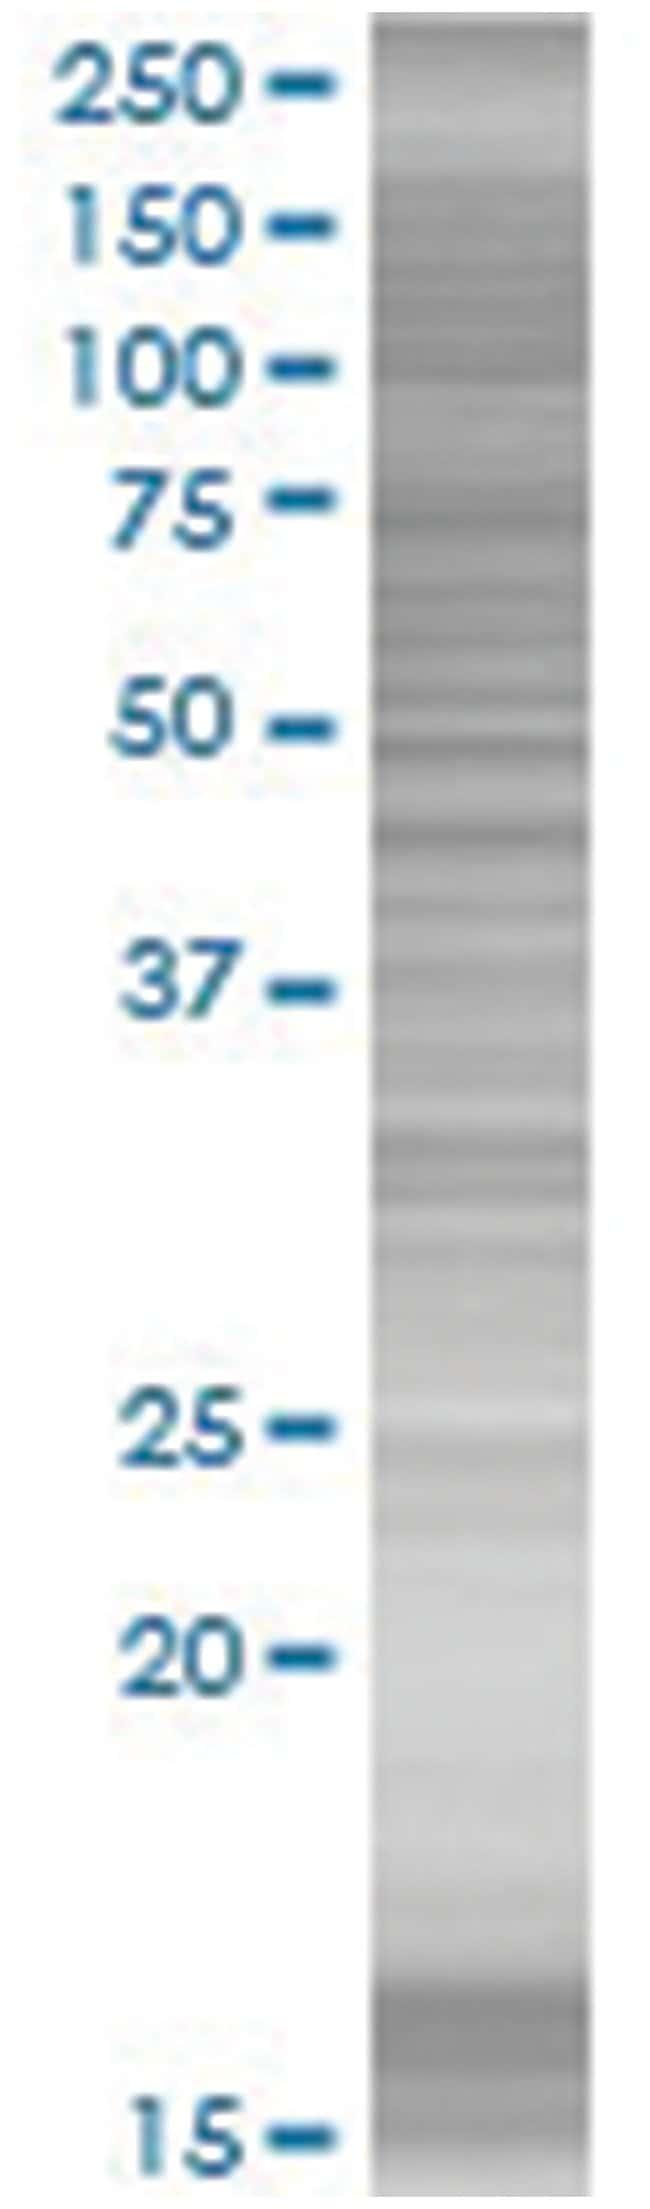 JUNB 293T Cell Overexpression Lysate (Denatured), Abnova 100µL:Life